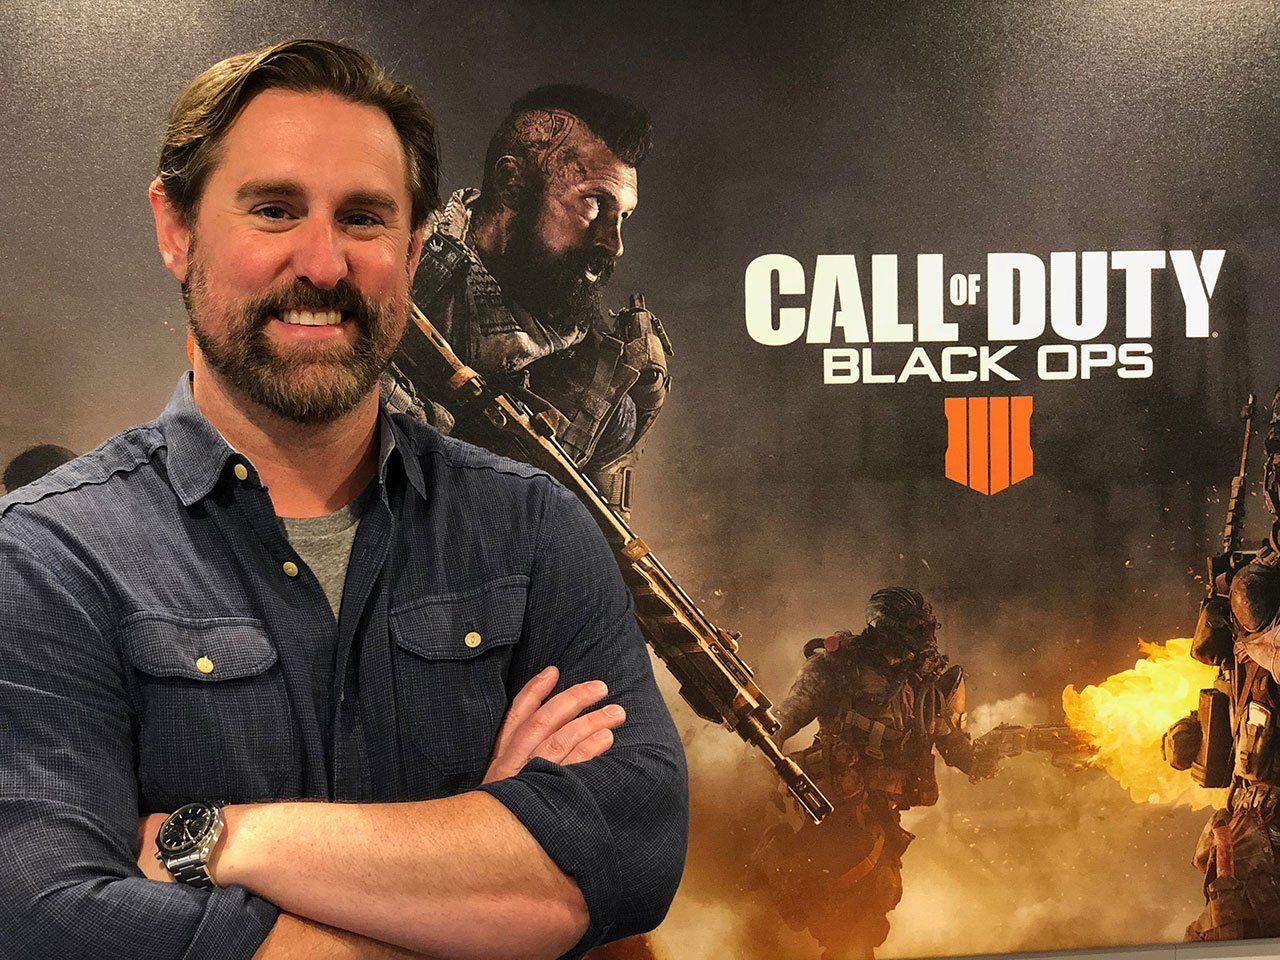 Call of Duty Dan Bunting